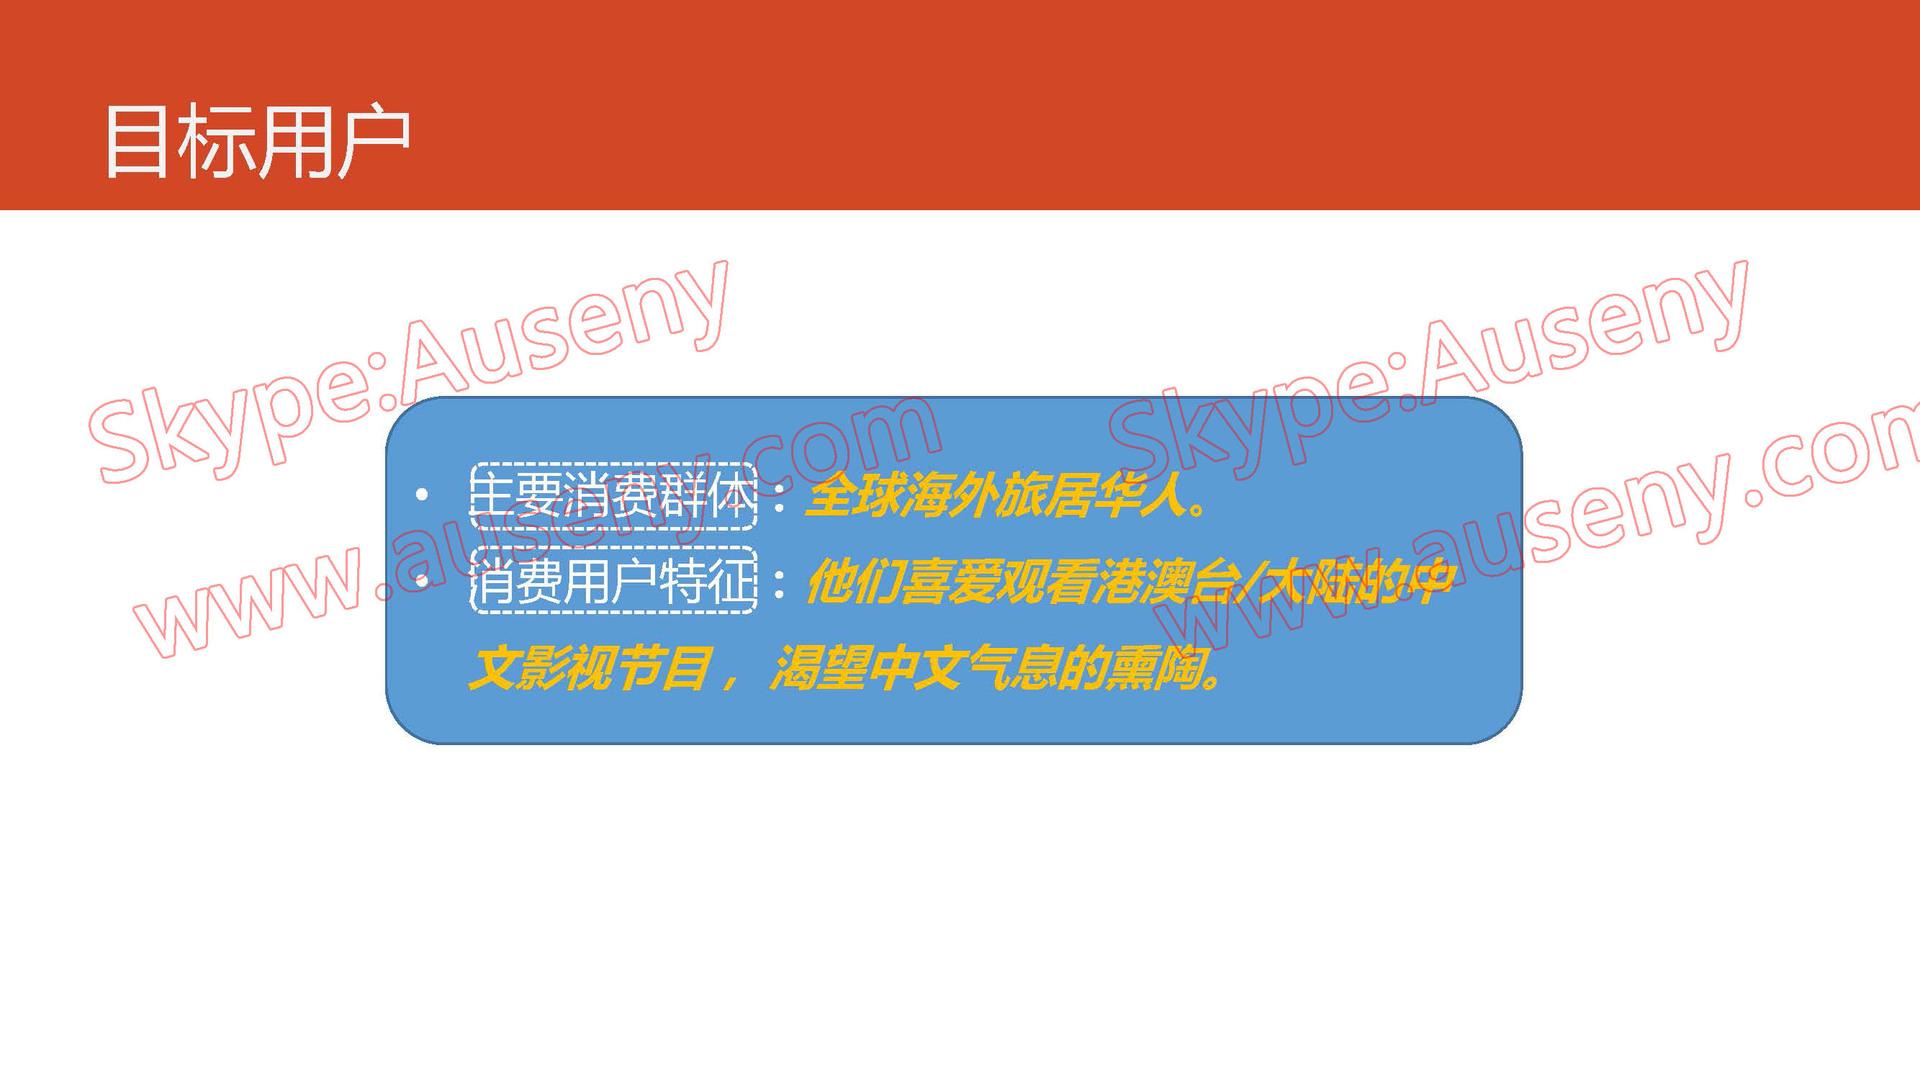 【tvpad 3正品 网络播放器TVPAD第三代海外华